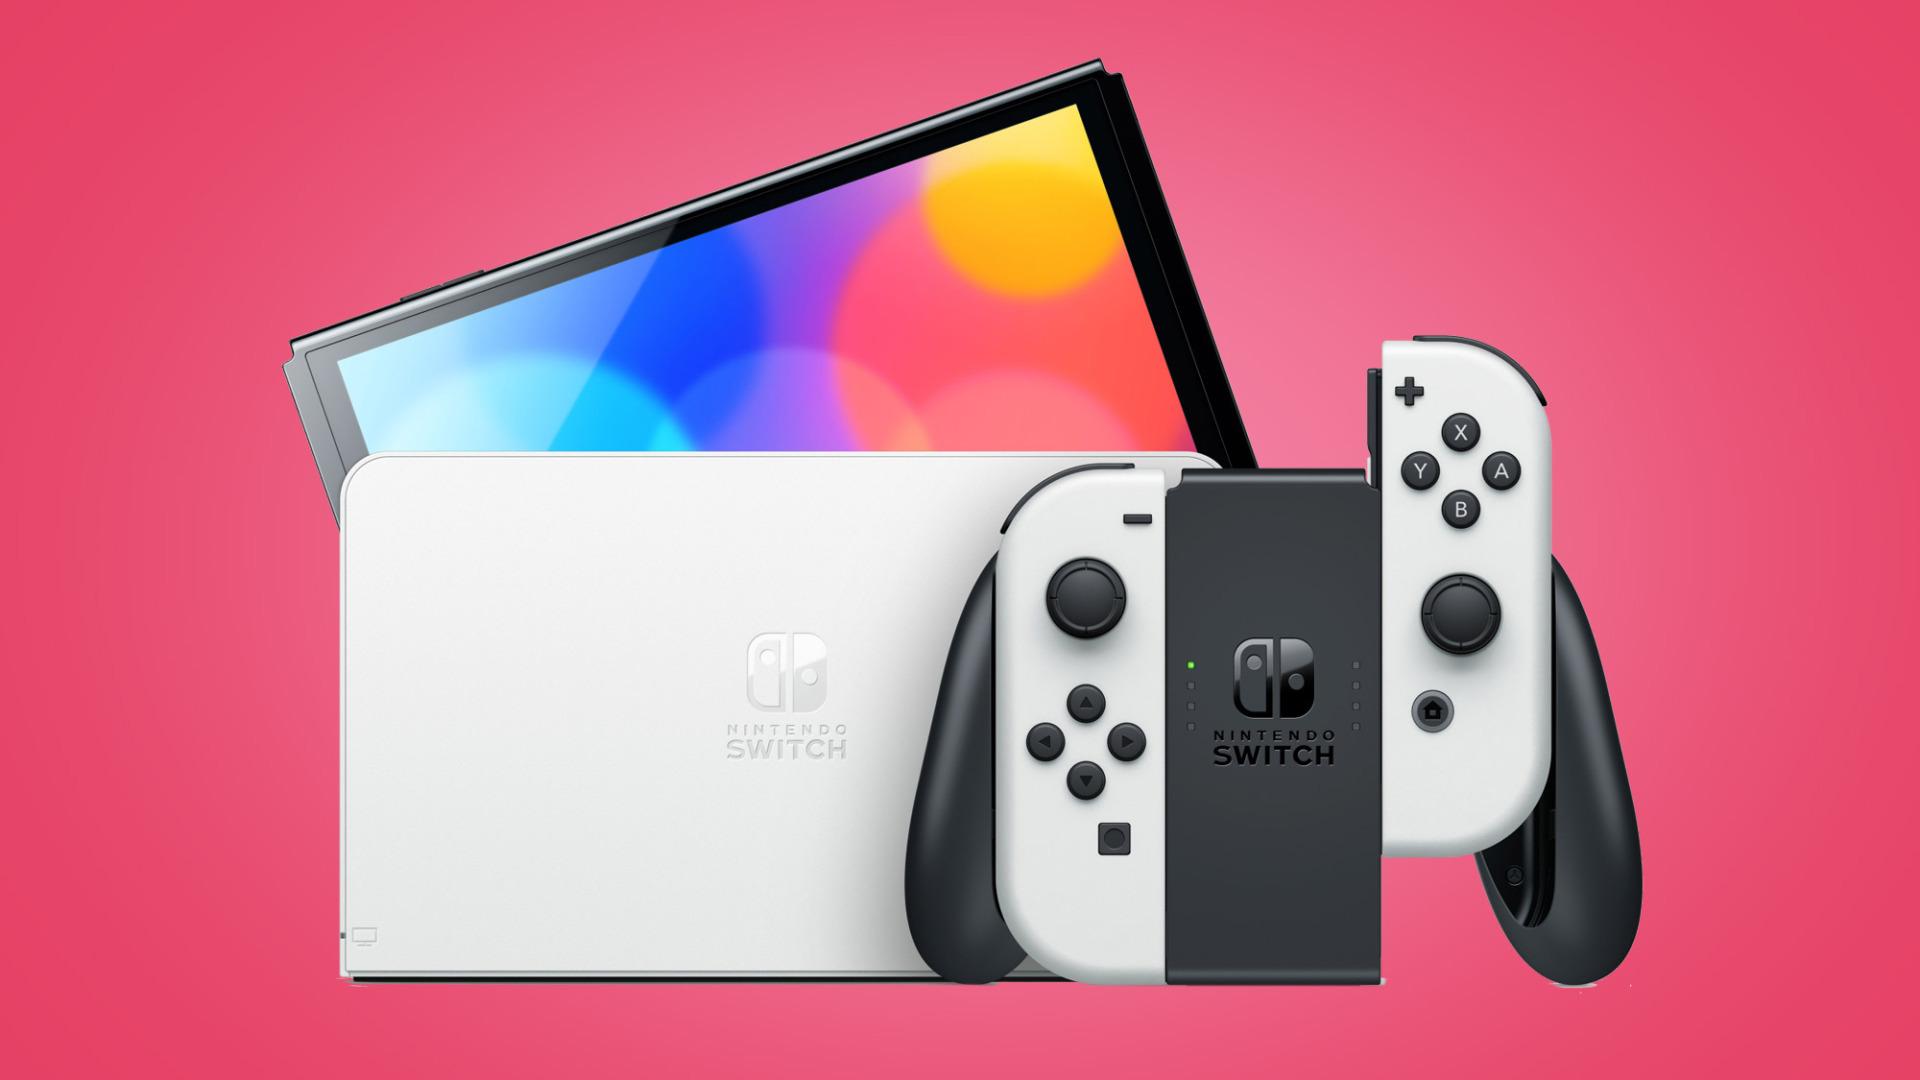 Gaming, Spiele, Konsole, Games, Nintendo, Konsolen, Nintendo Switch, Joy-Cons, OLED-Modell